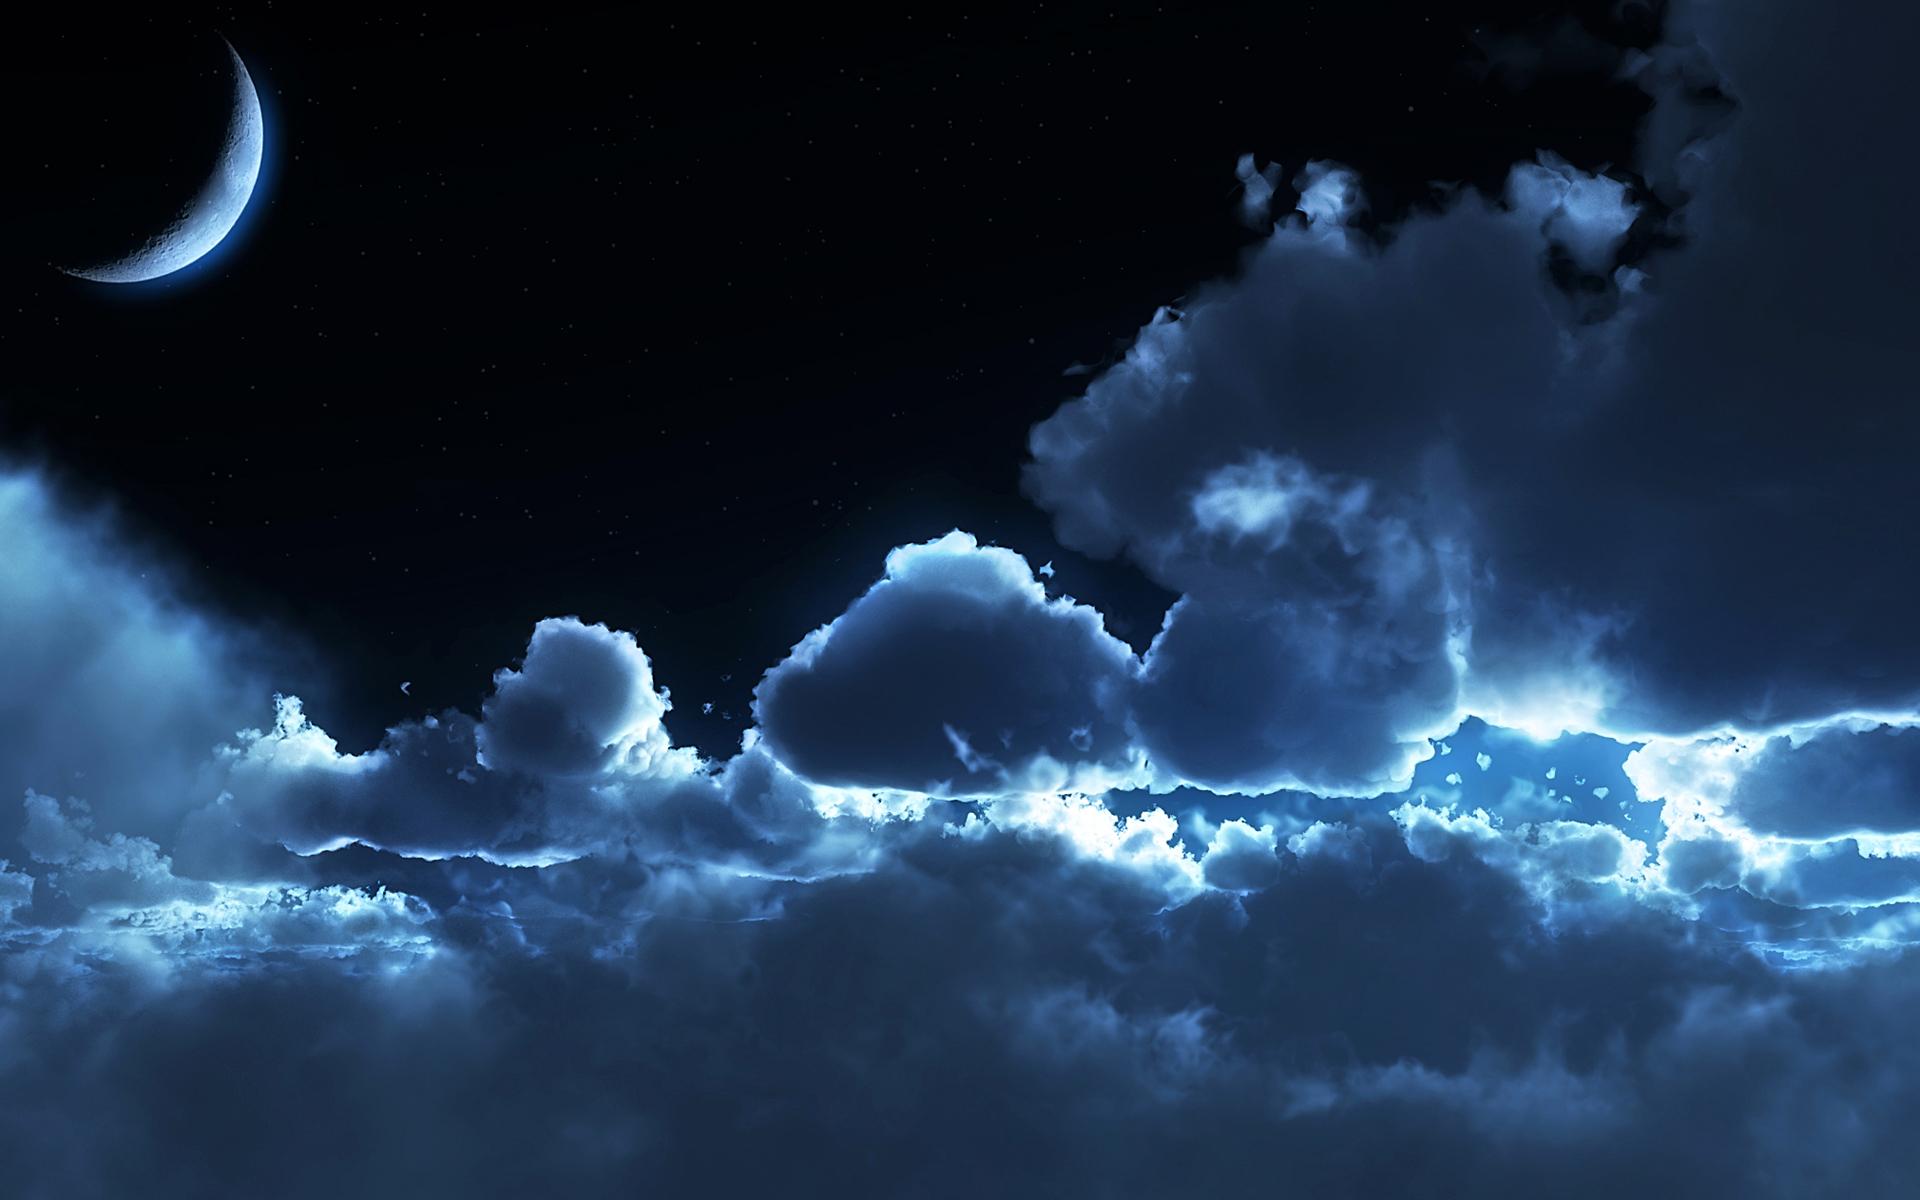 fondos nubes adnfriki (8)